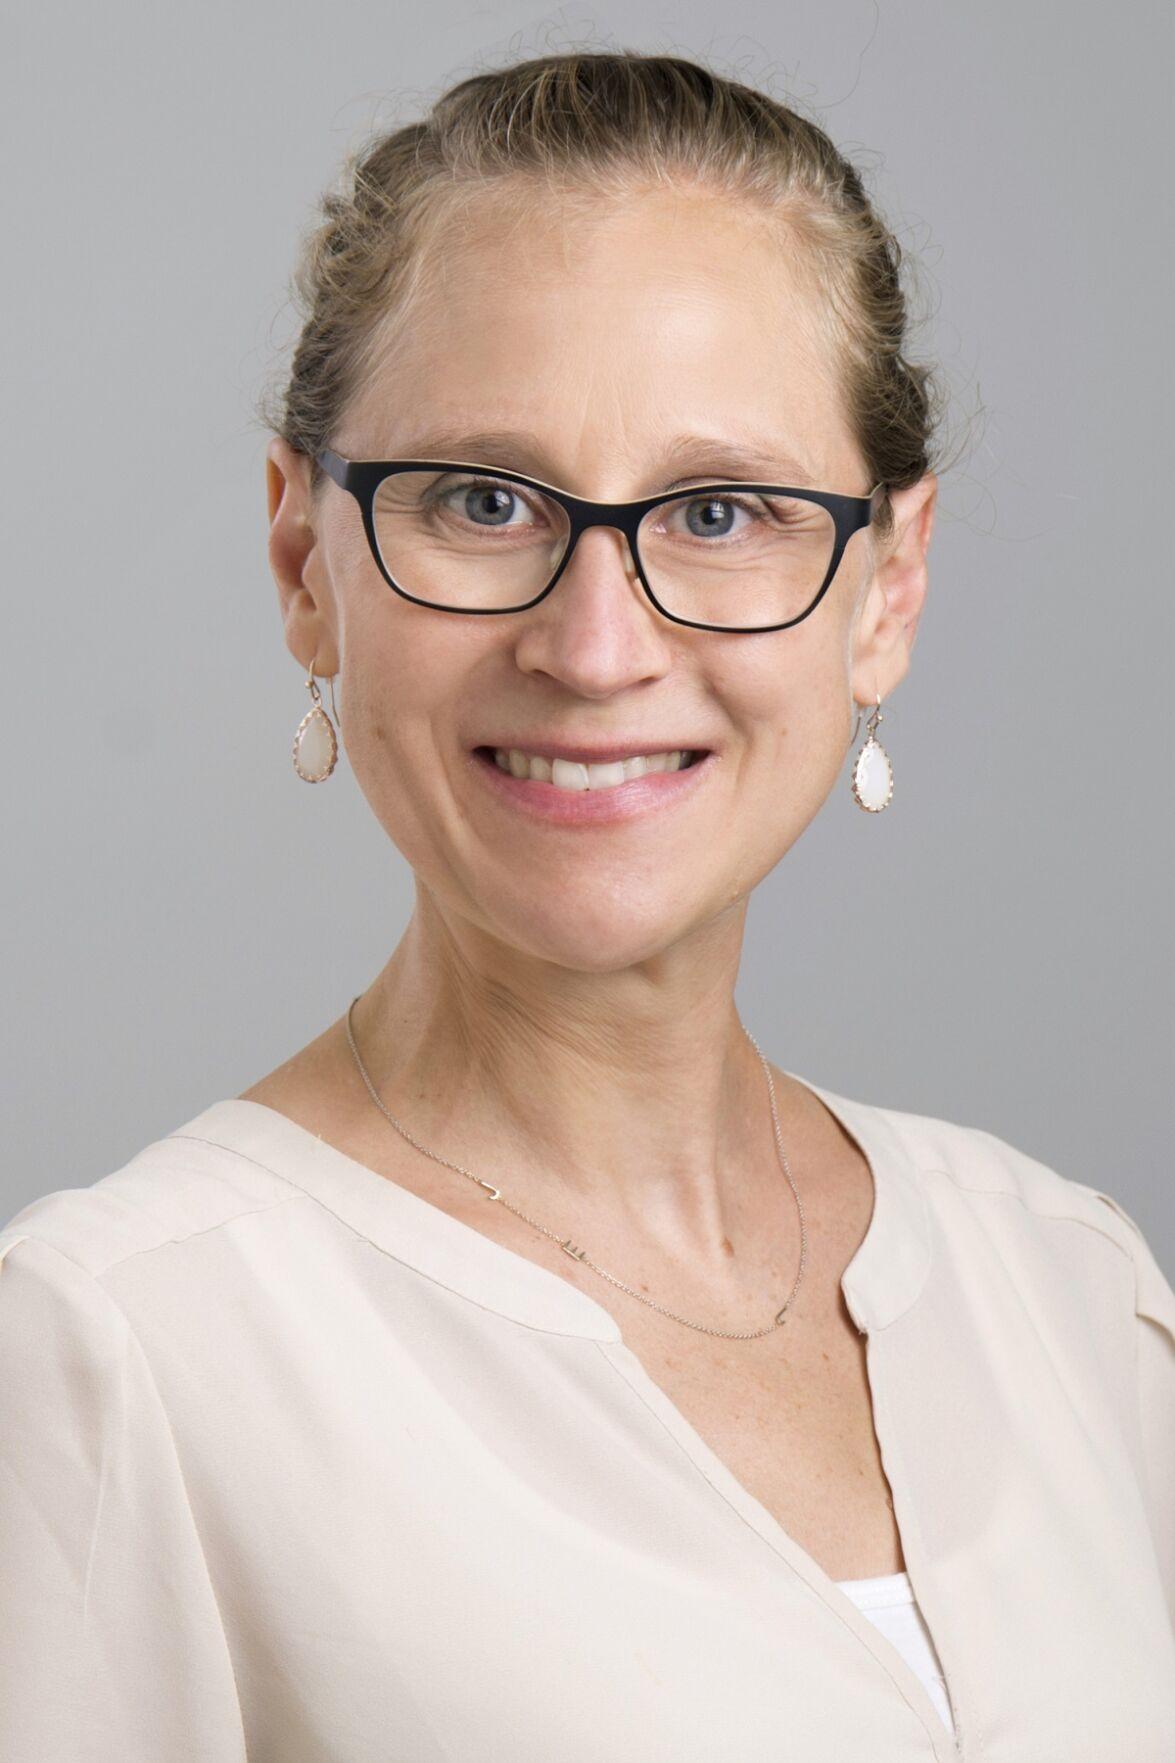 Dr. Amanda Hassinger